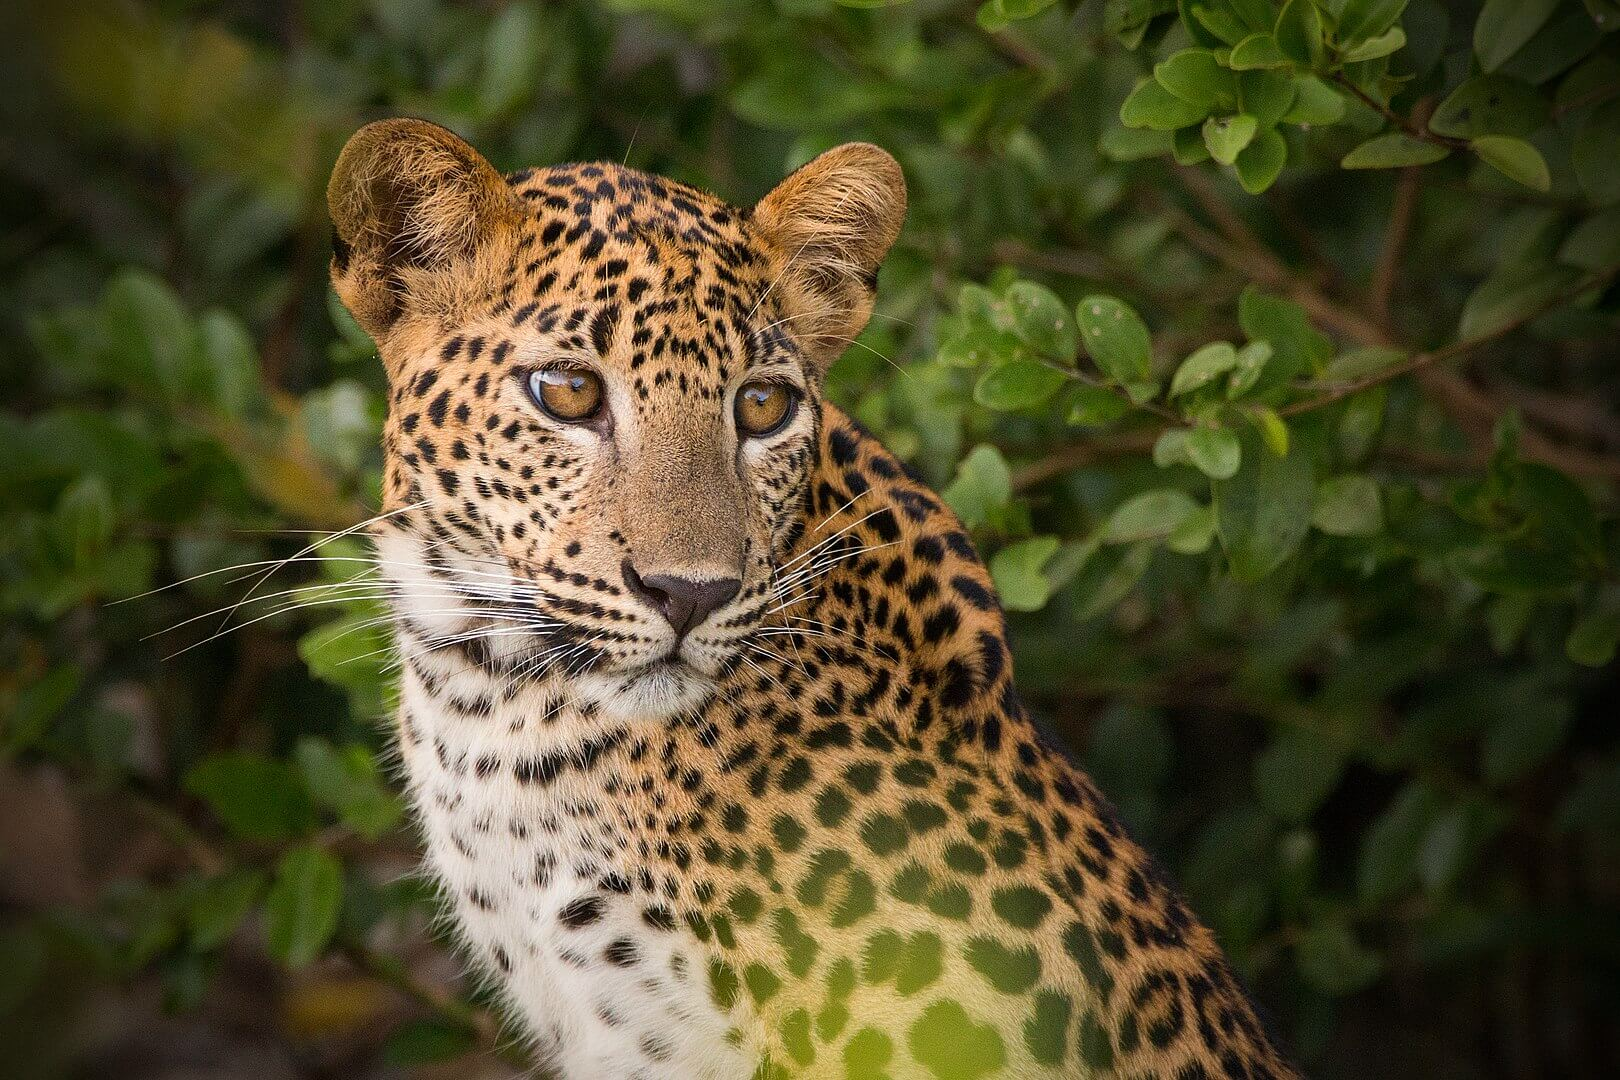 1620px-sri_lankan_leopard_at_wilpattu_national_park_-_brave_beauty-compressor